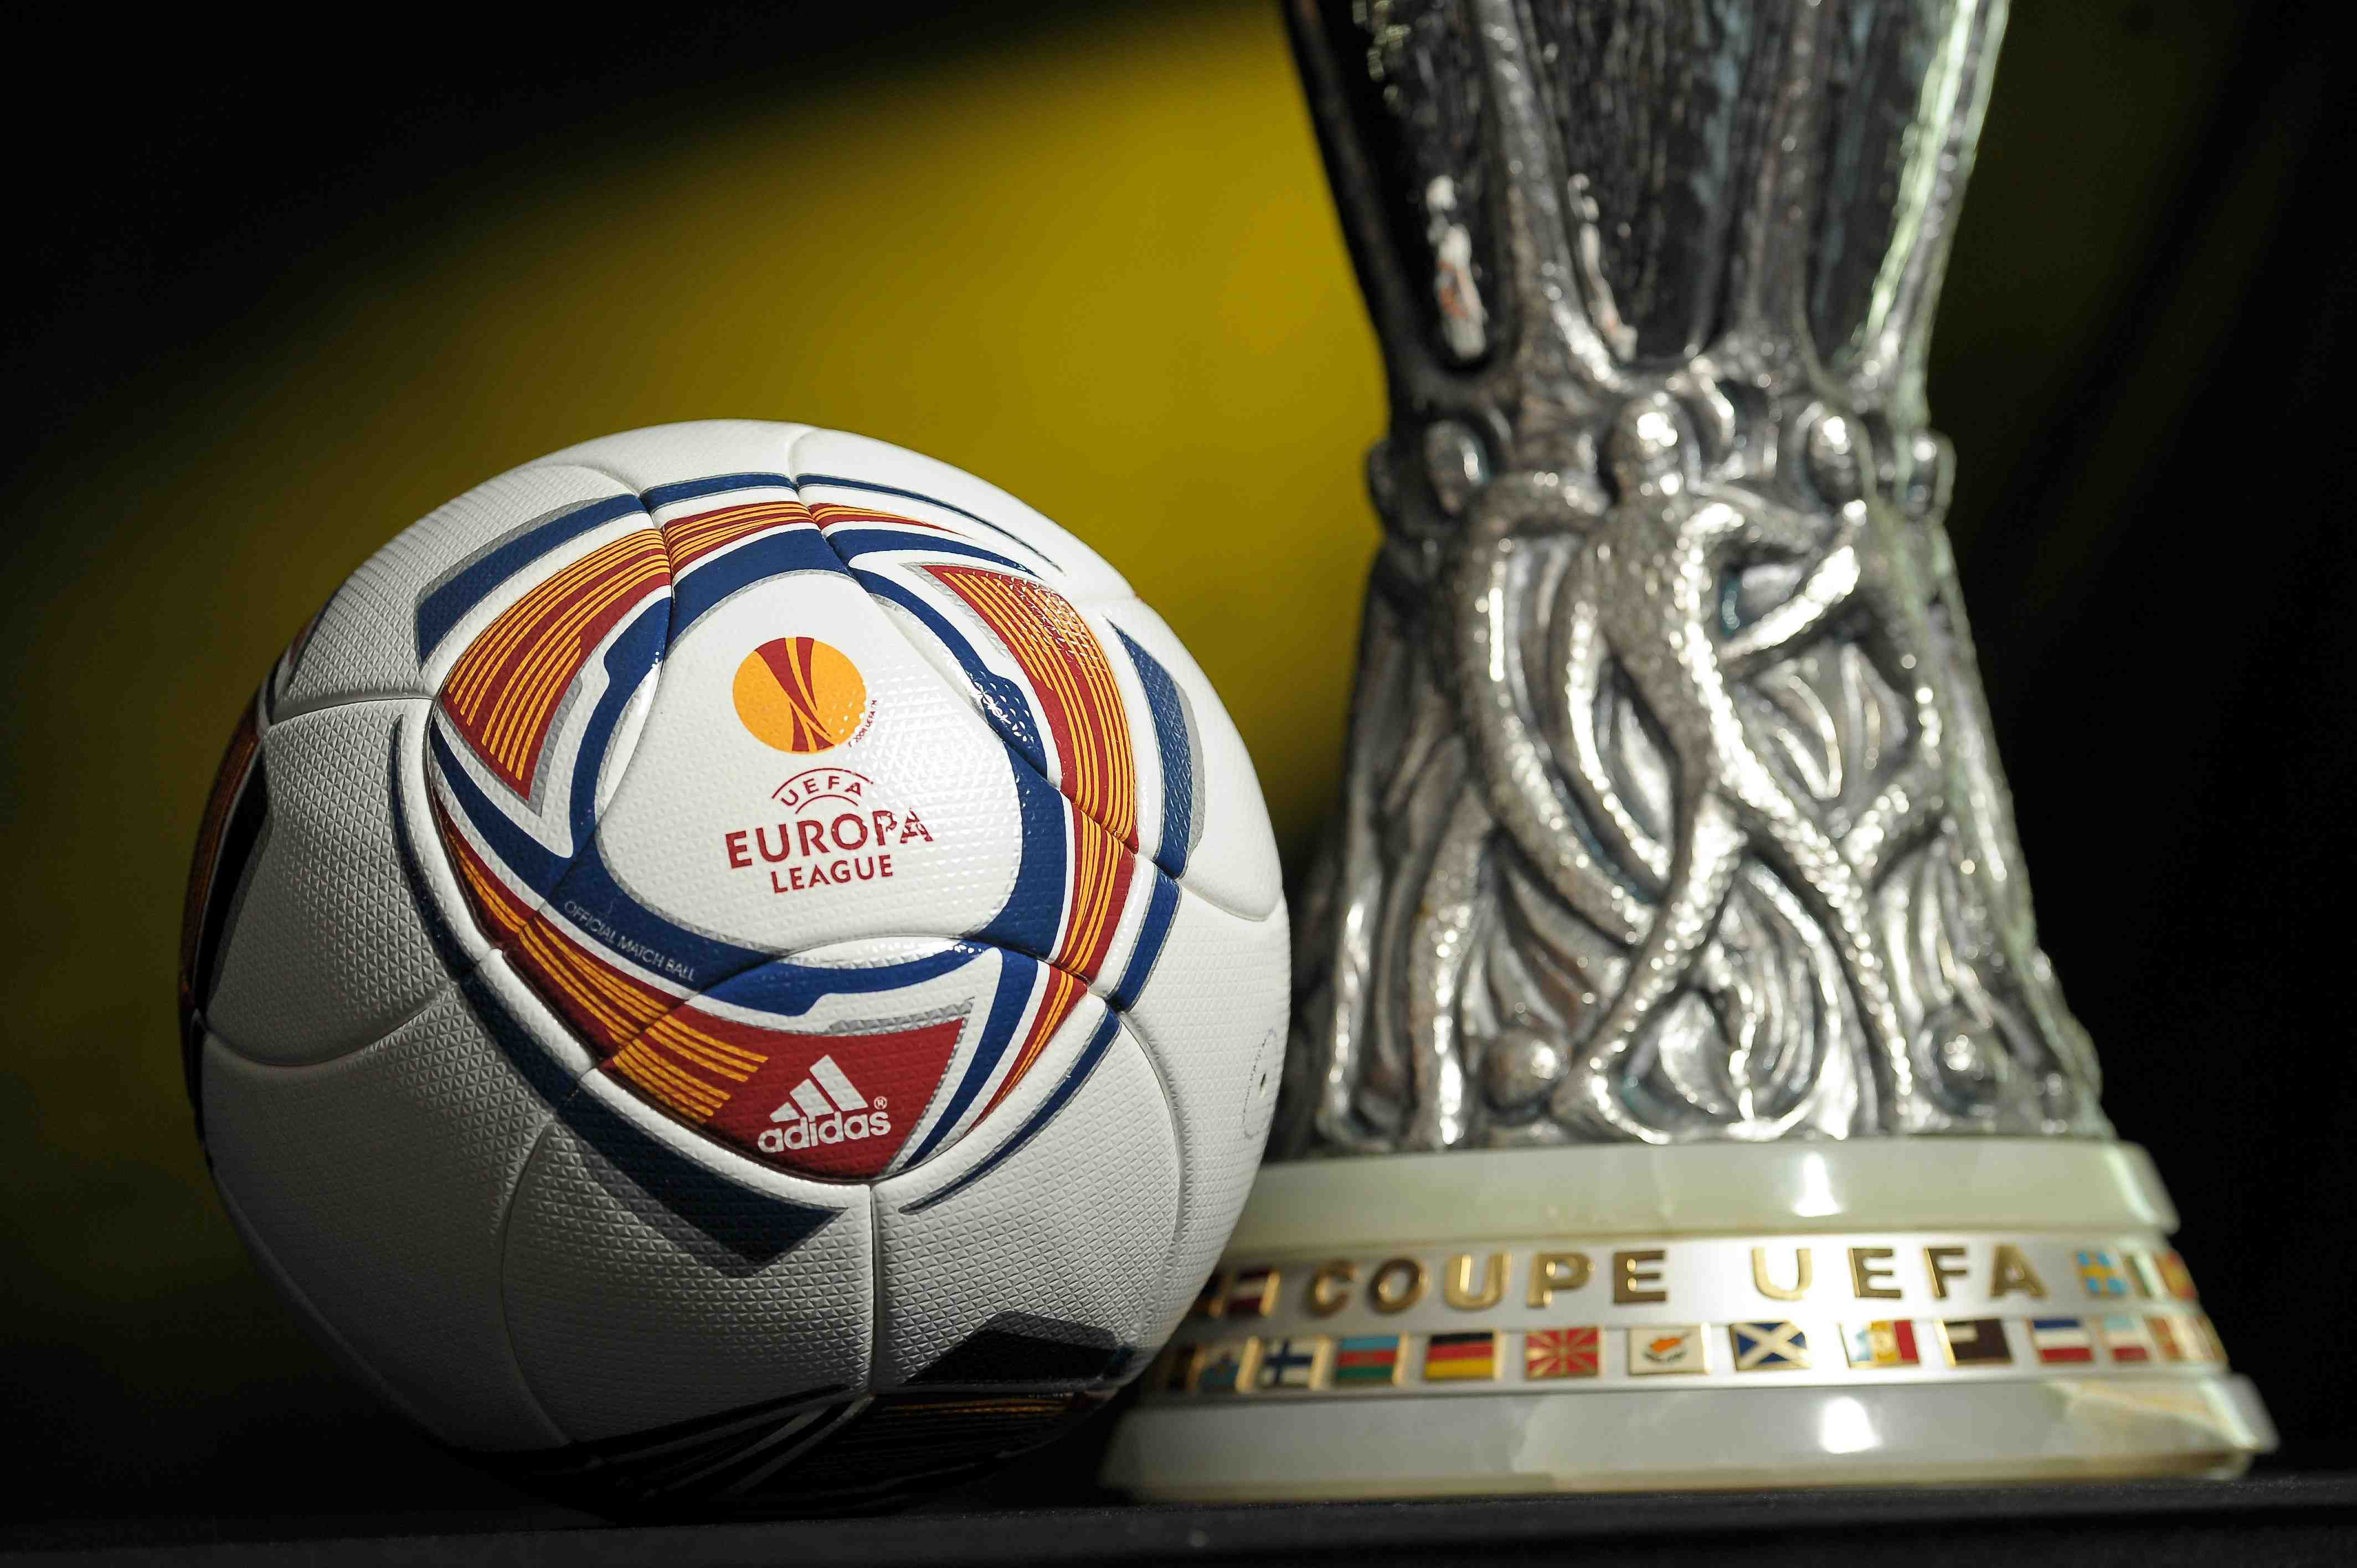 General views of trophies and yearbook - 2011 UEFA Super Cup